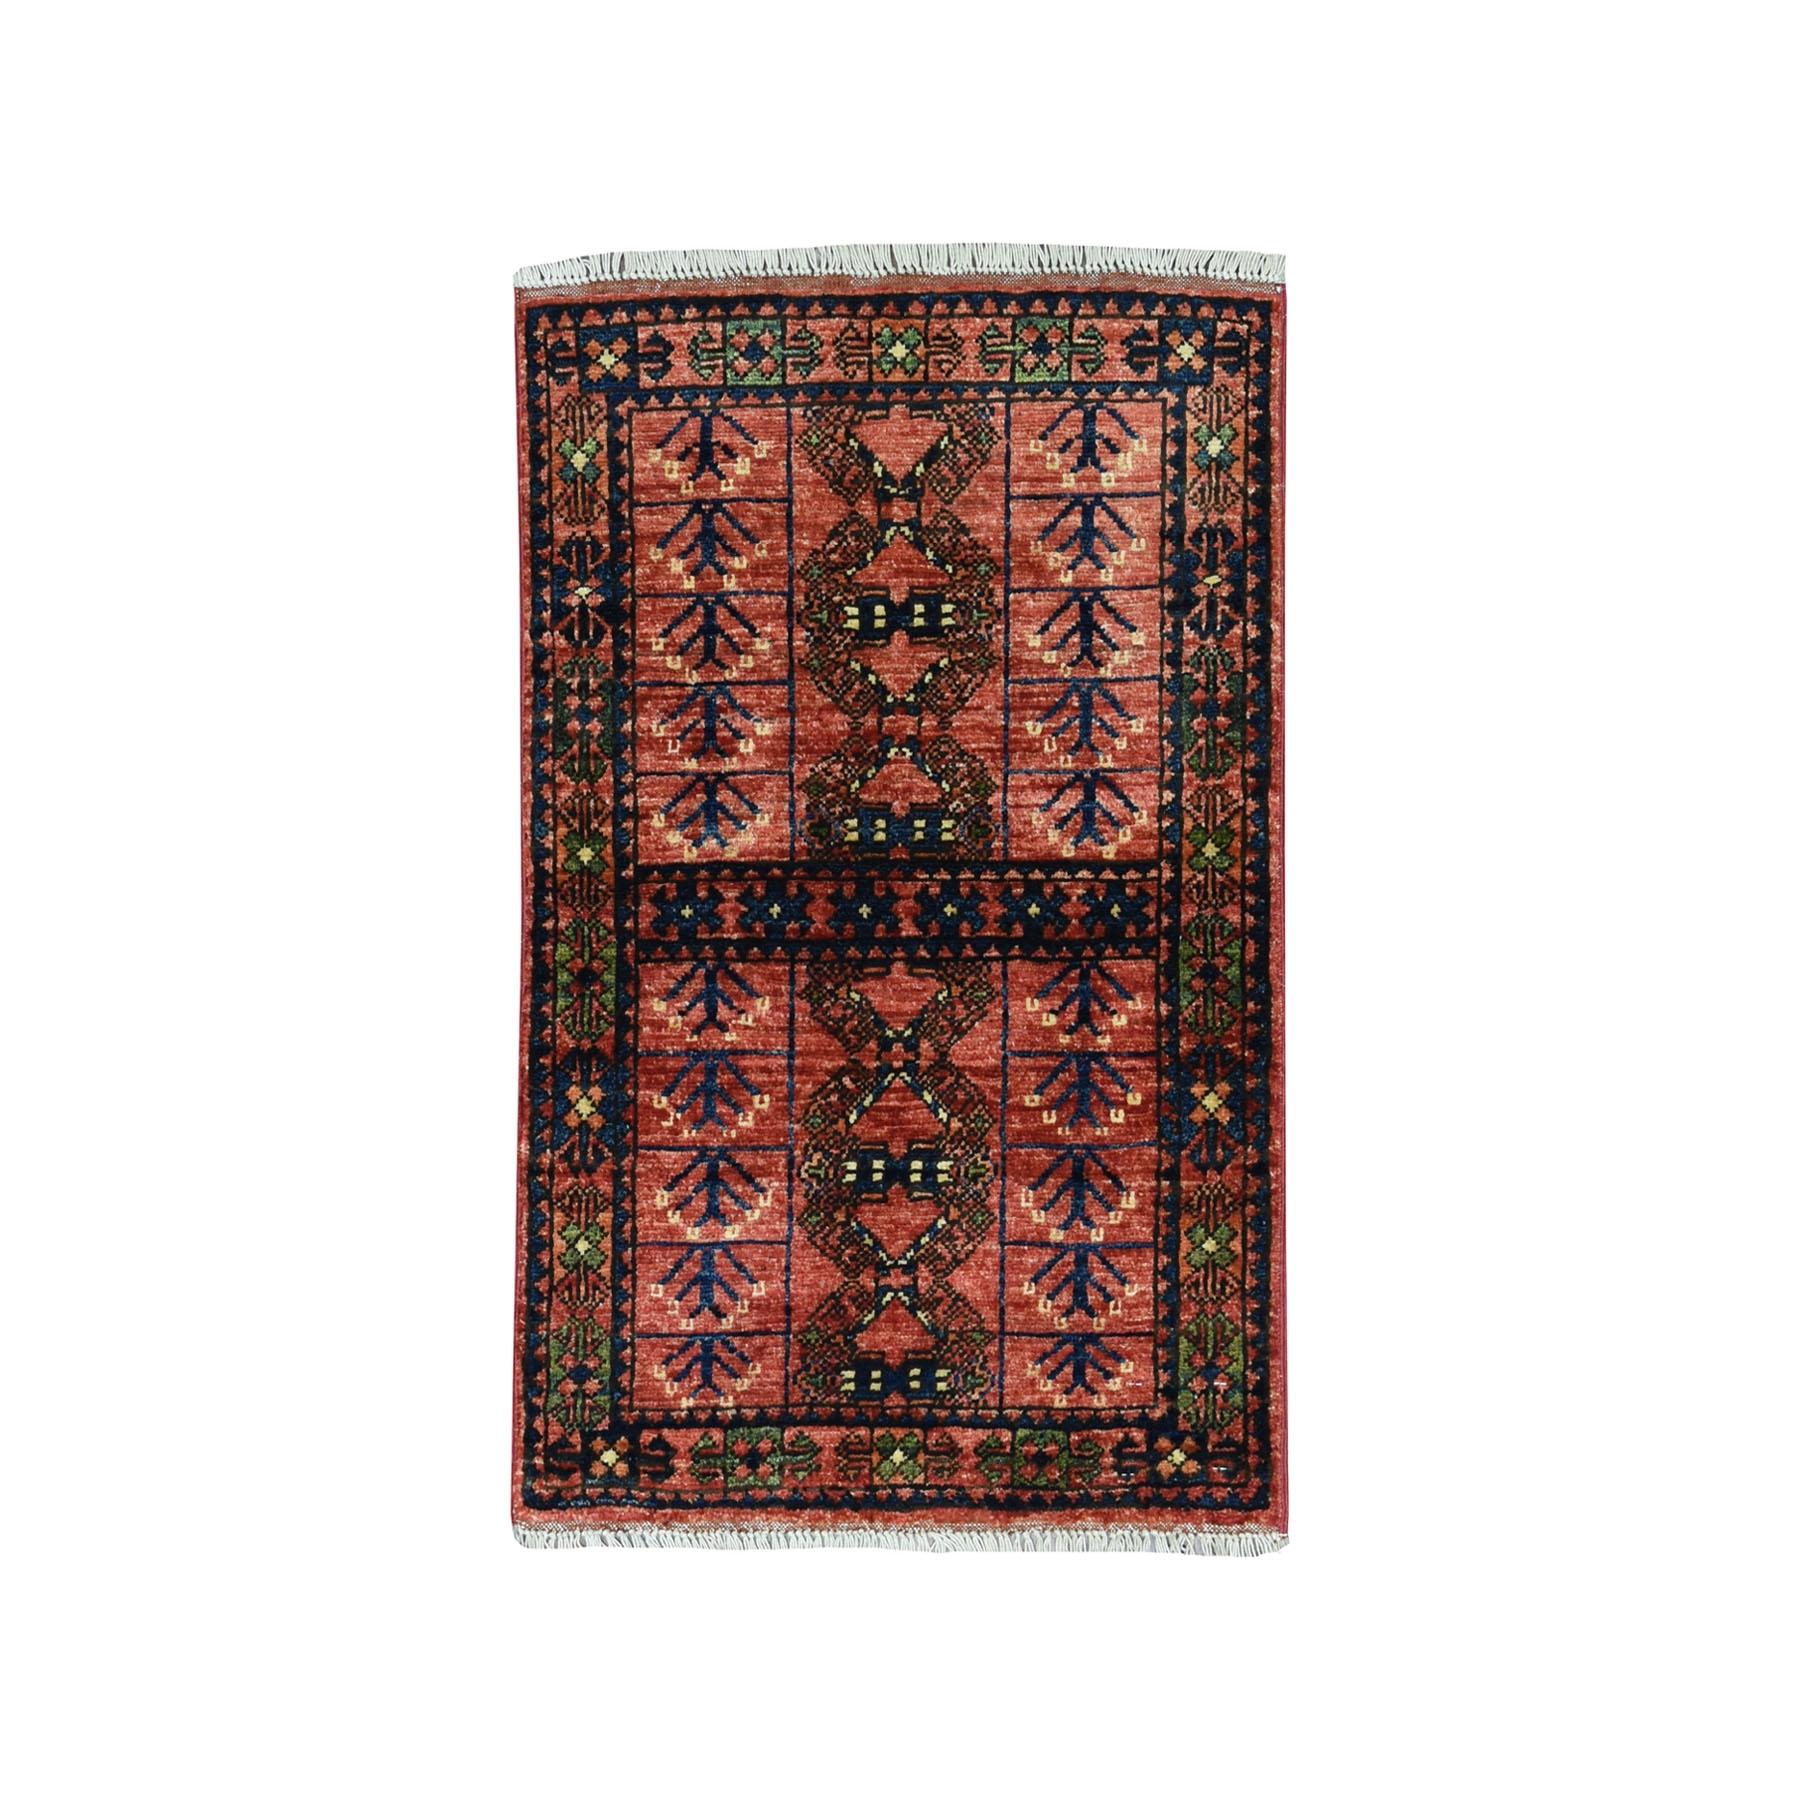 2'x3' Afghan Ersari Pure Wool Hand Knotted Oriental Rug